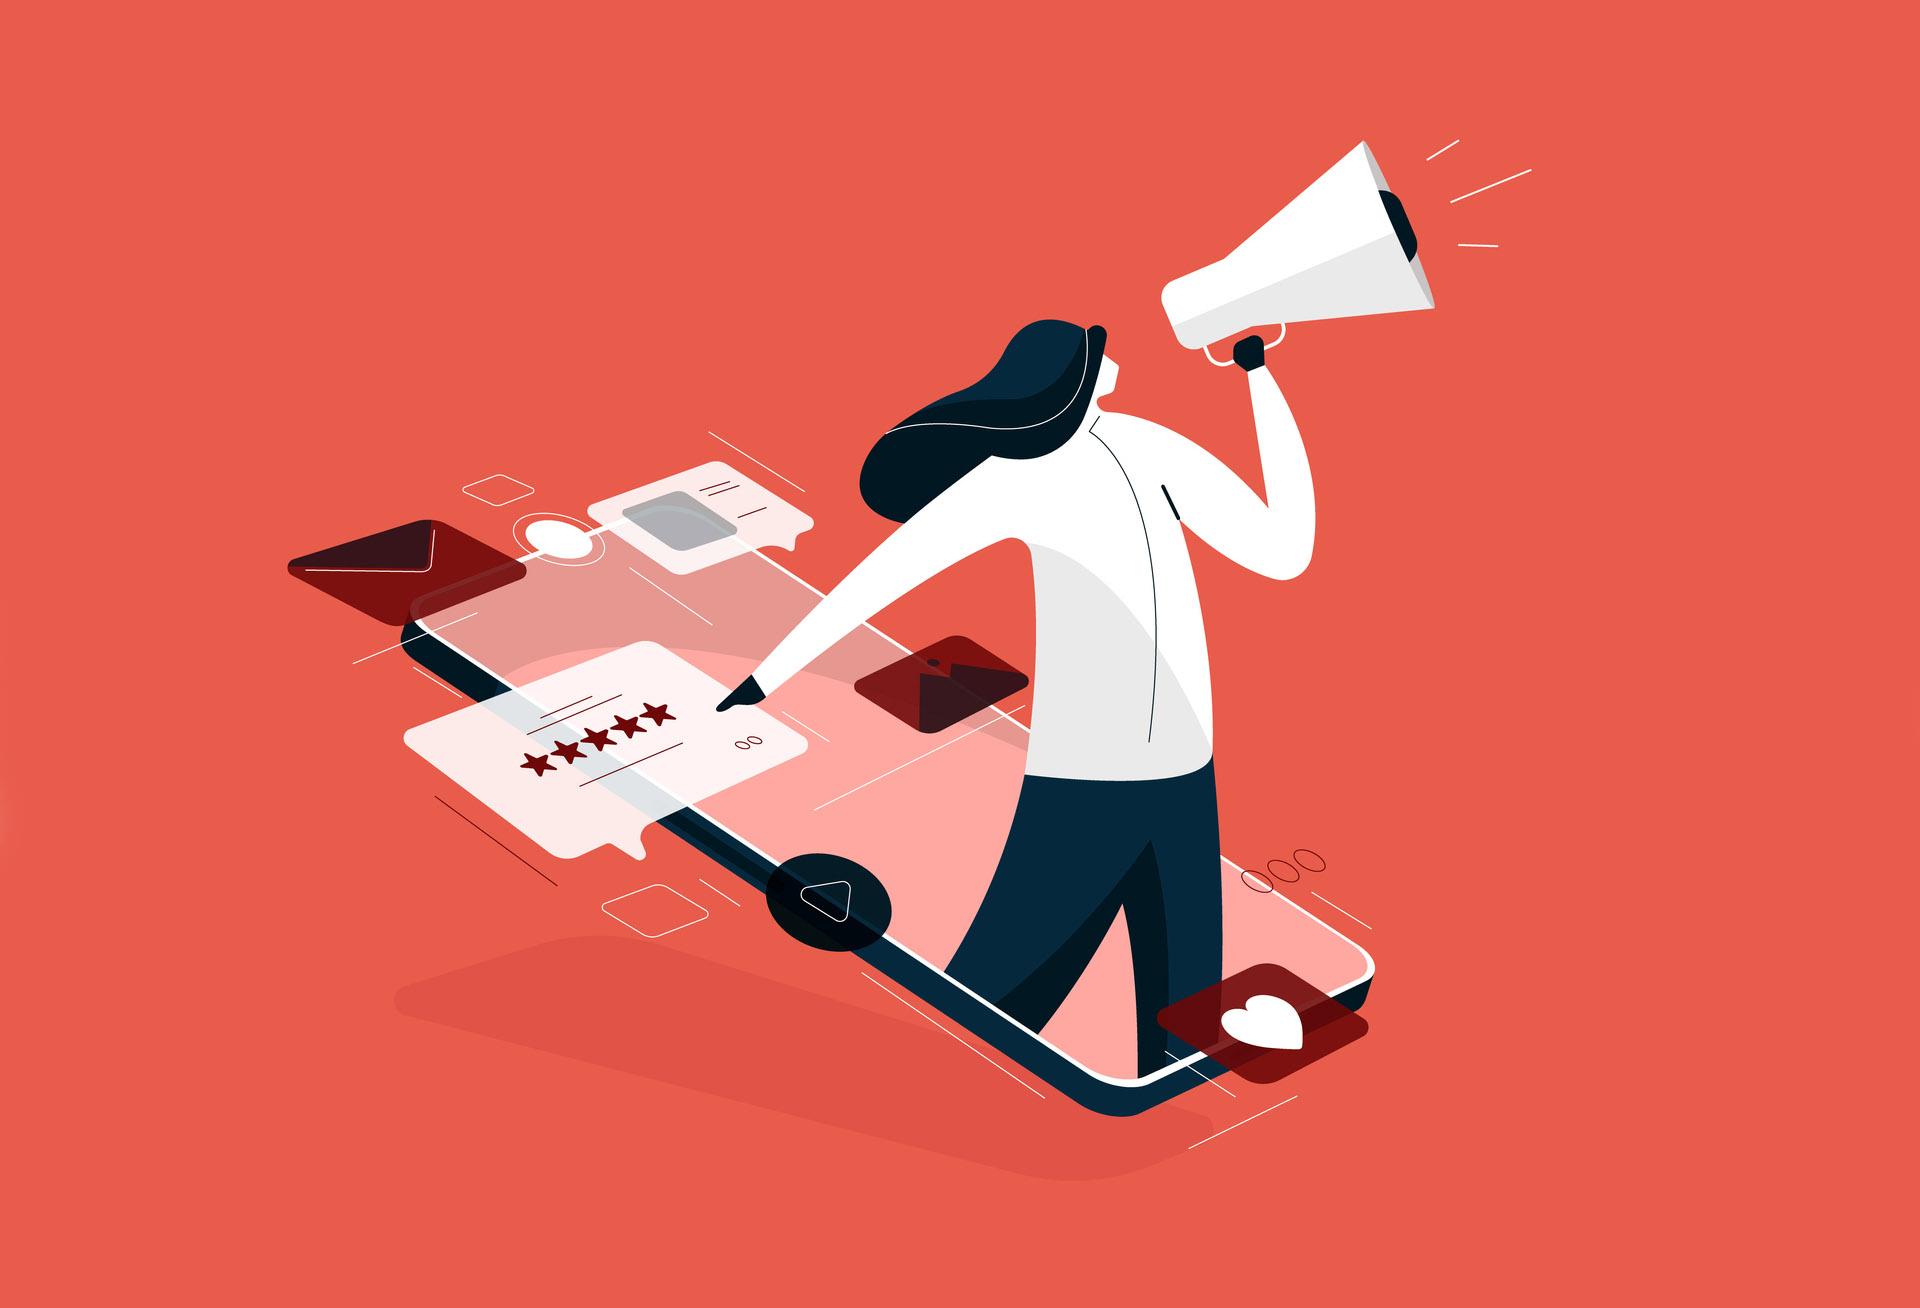 girl holding megaphone for Digital marketing, rating and feedback illustration, Digital business advertising strategies vector concept